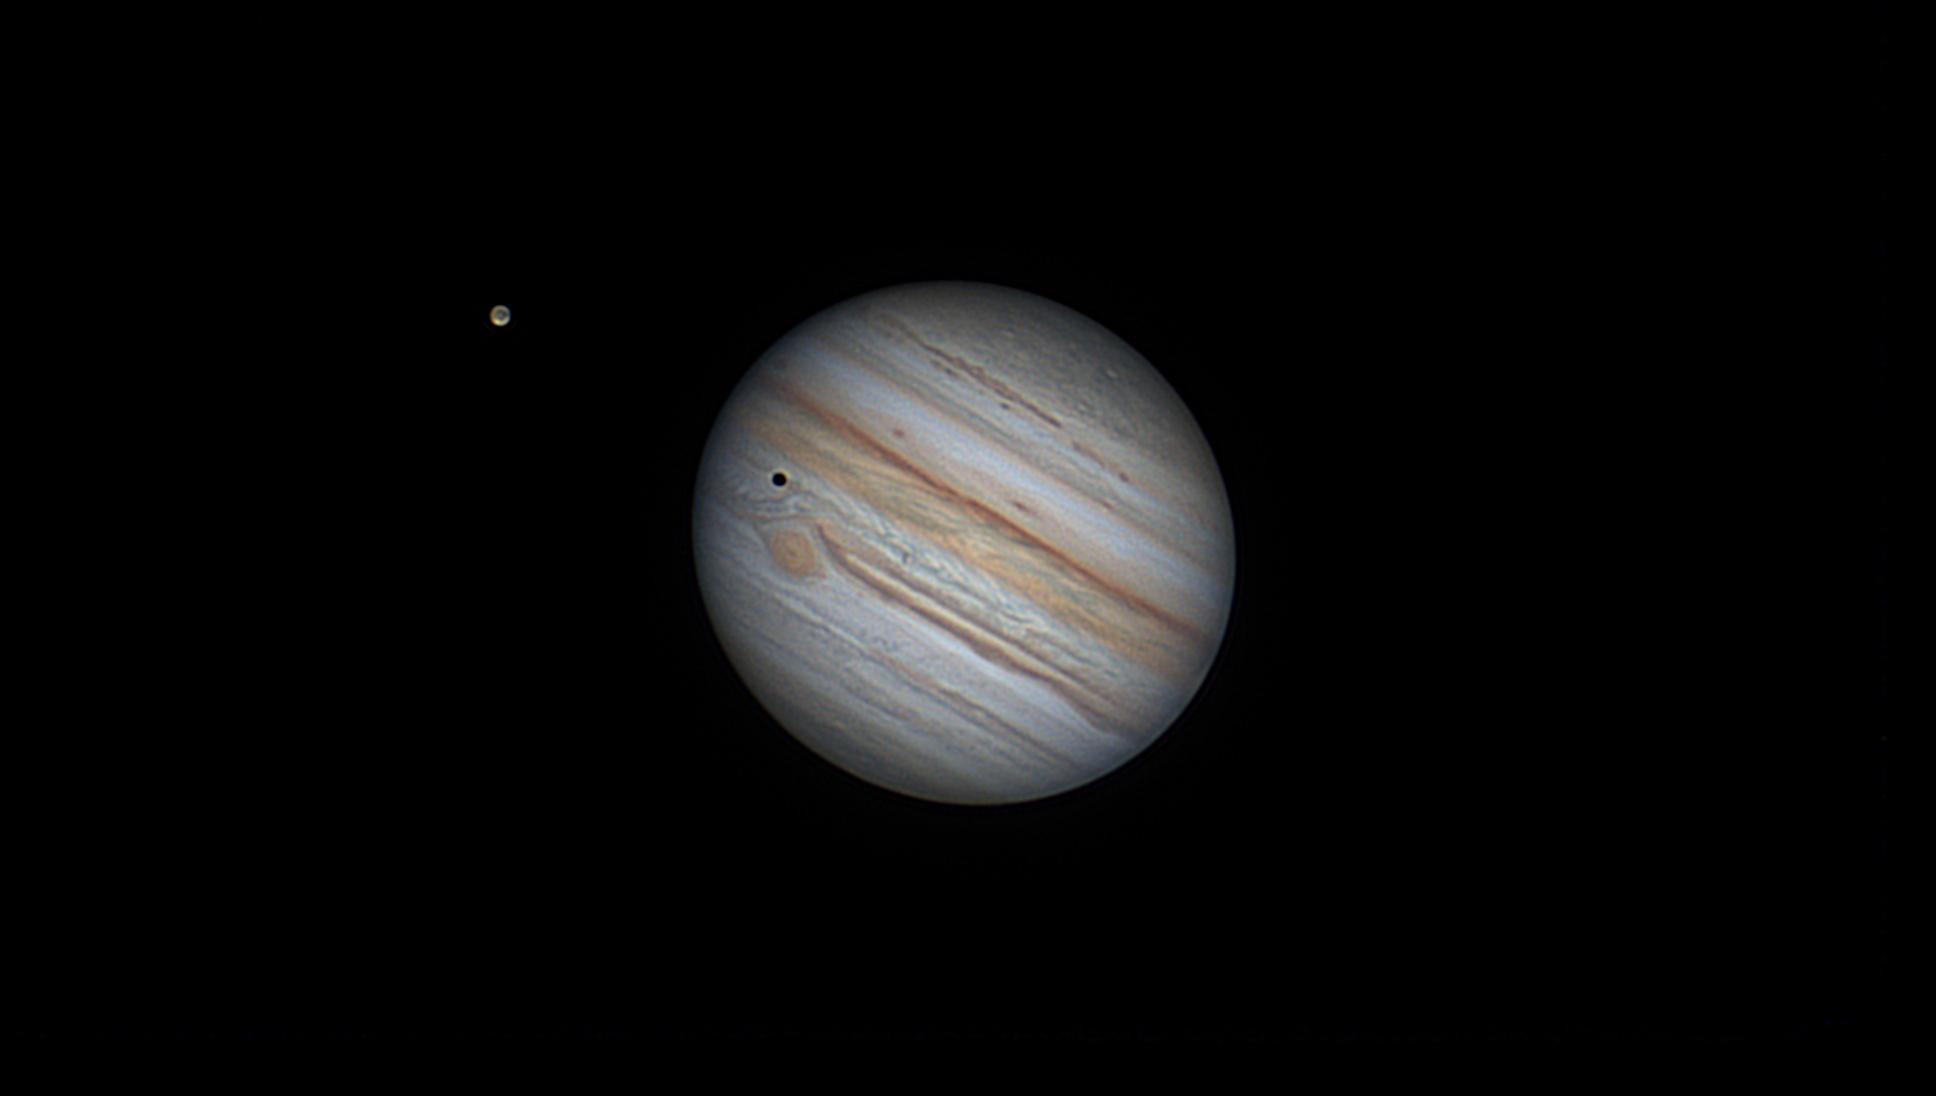 2021-09-05-2323_2-Jupiter_lapl5_ap499_conv do.jpg